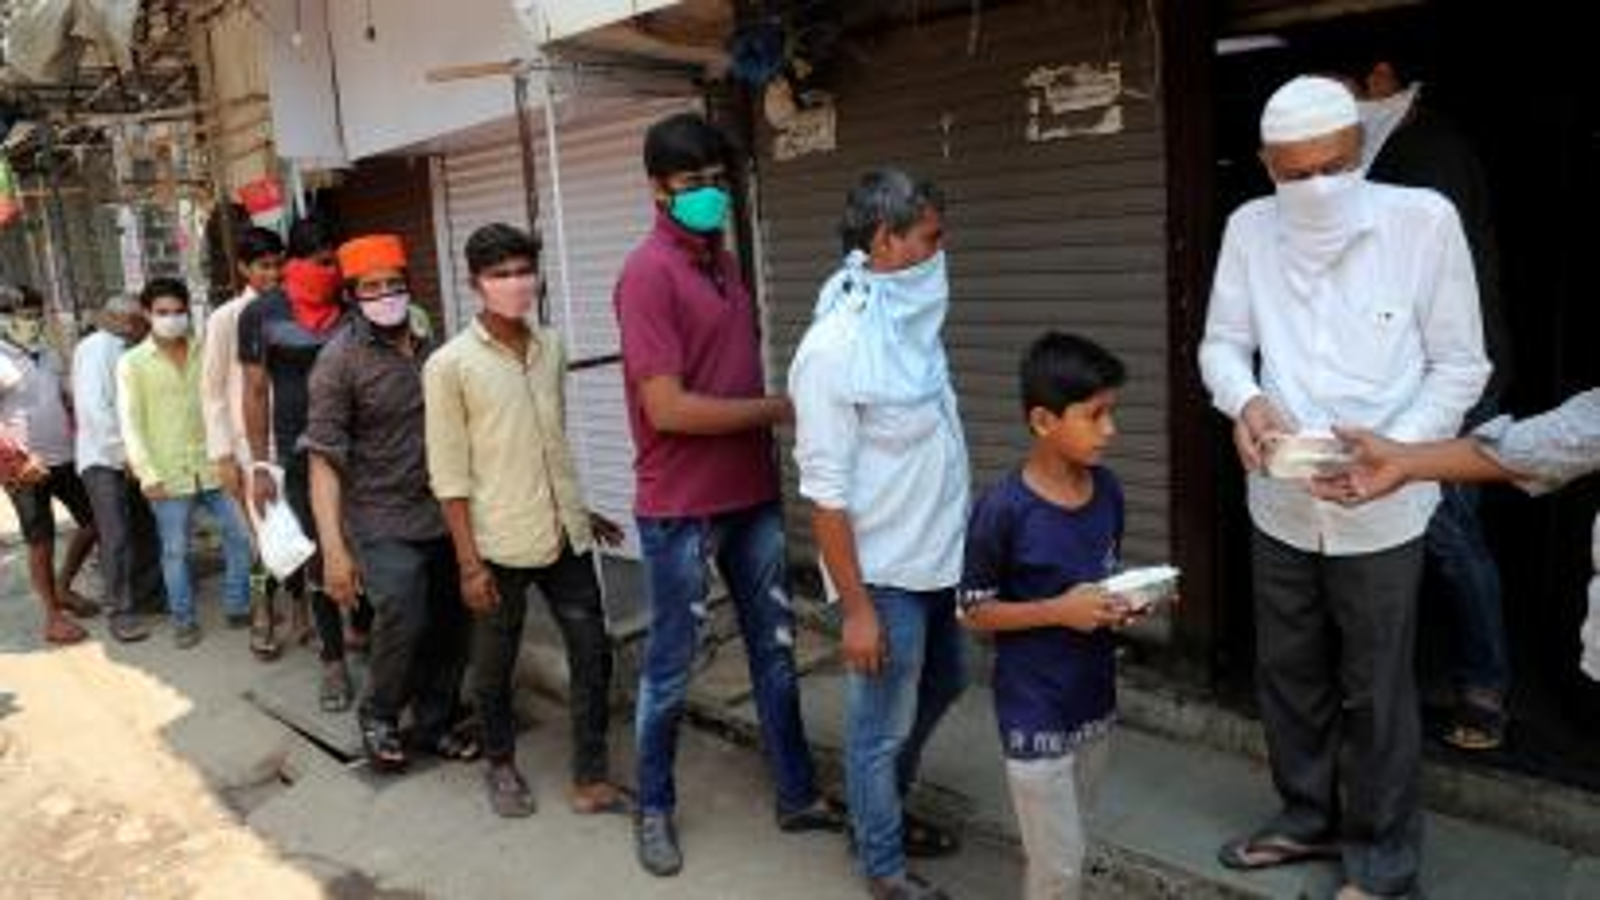 Indian migrants are battling hunger during coronavirus lockdown.